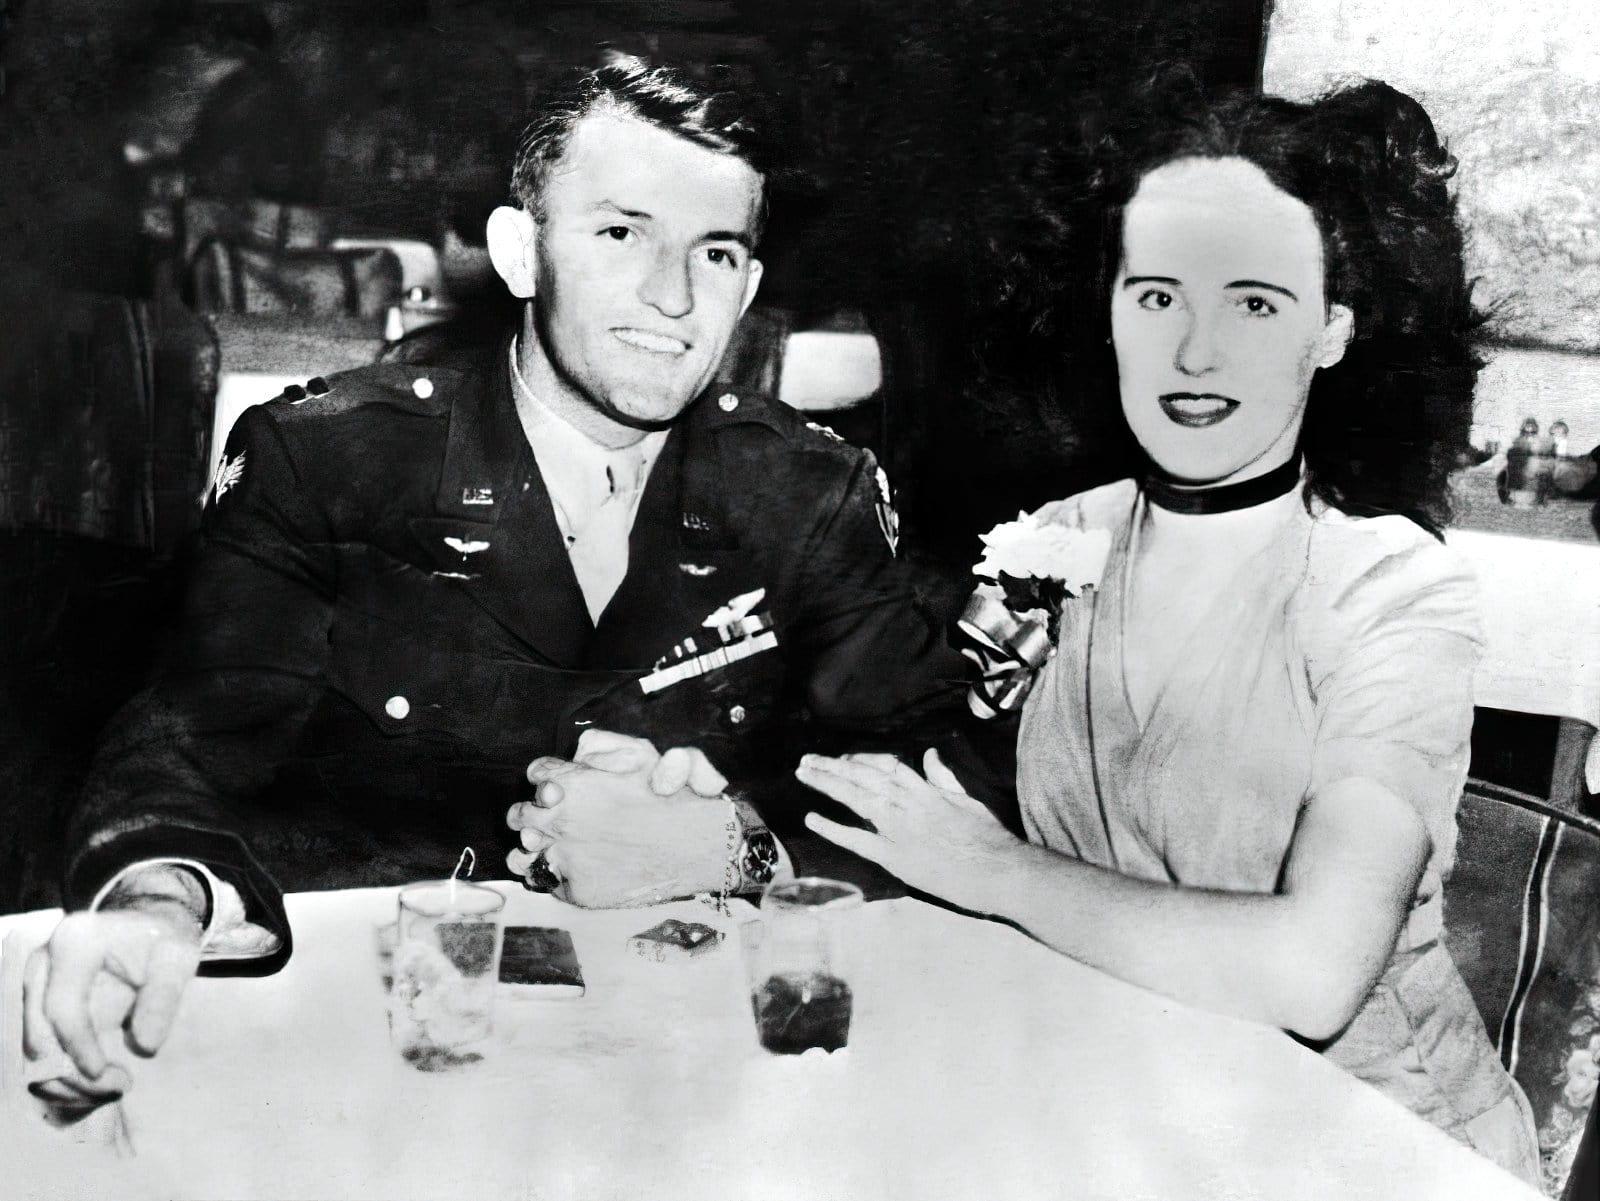 Black Dahlia - Beth Short with Major Matt M Gordon - later killed in an airplane crash